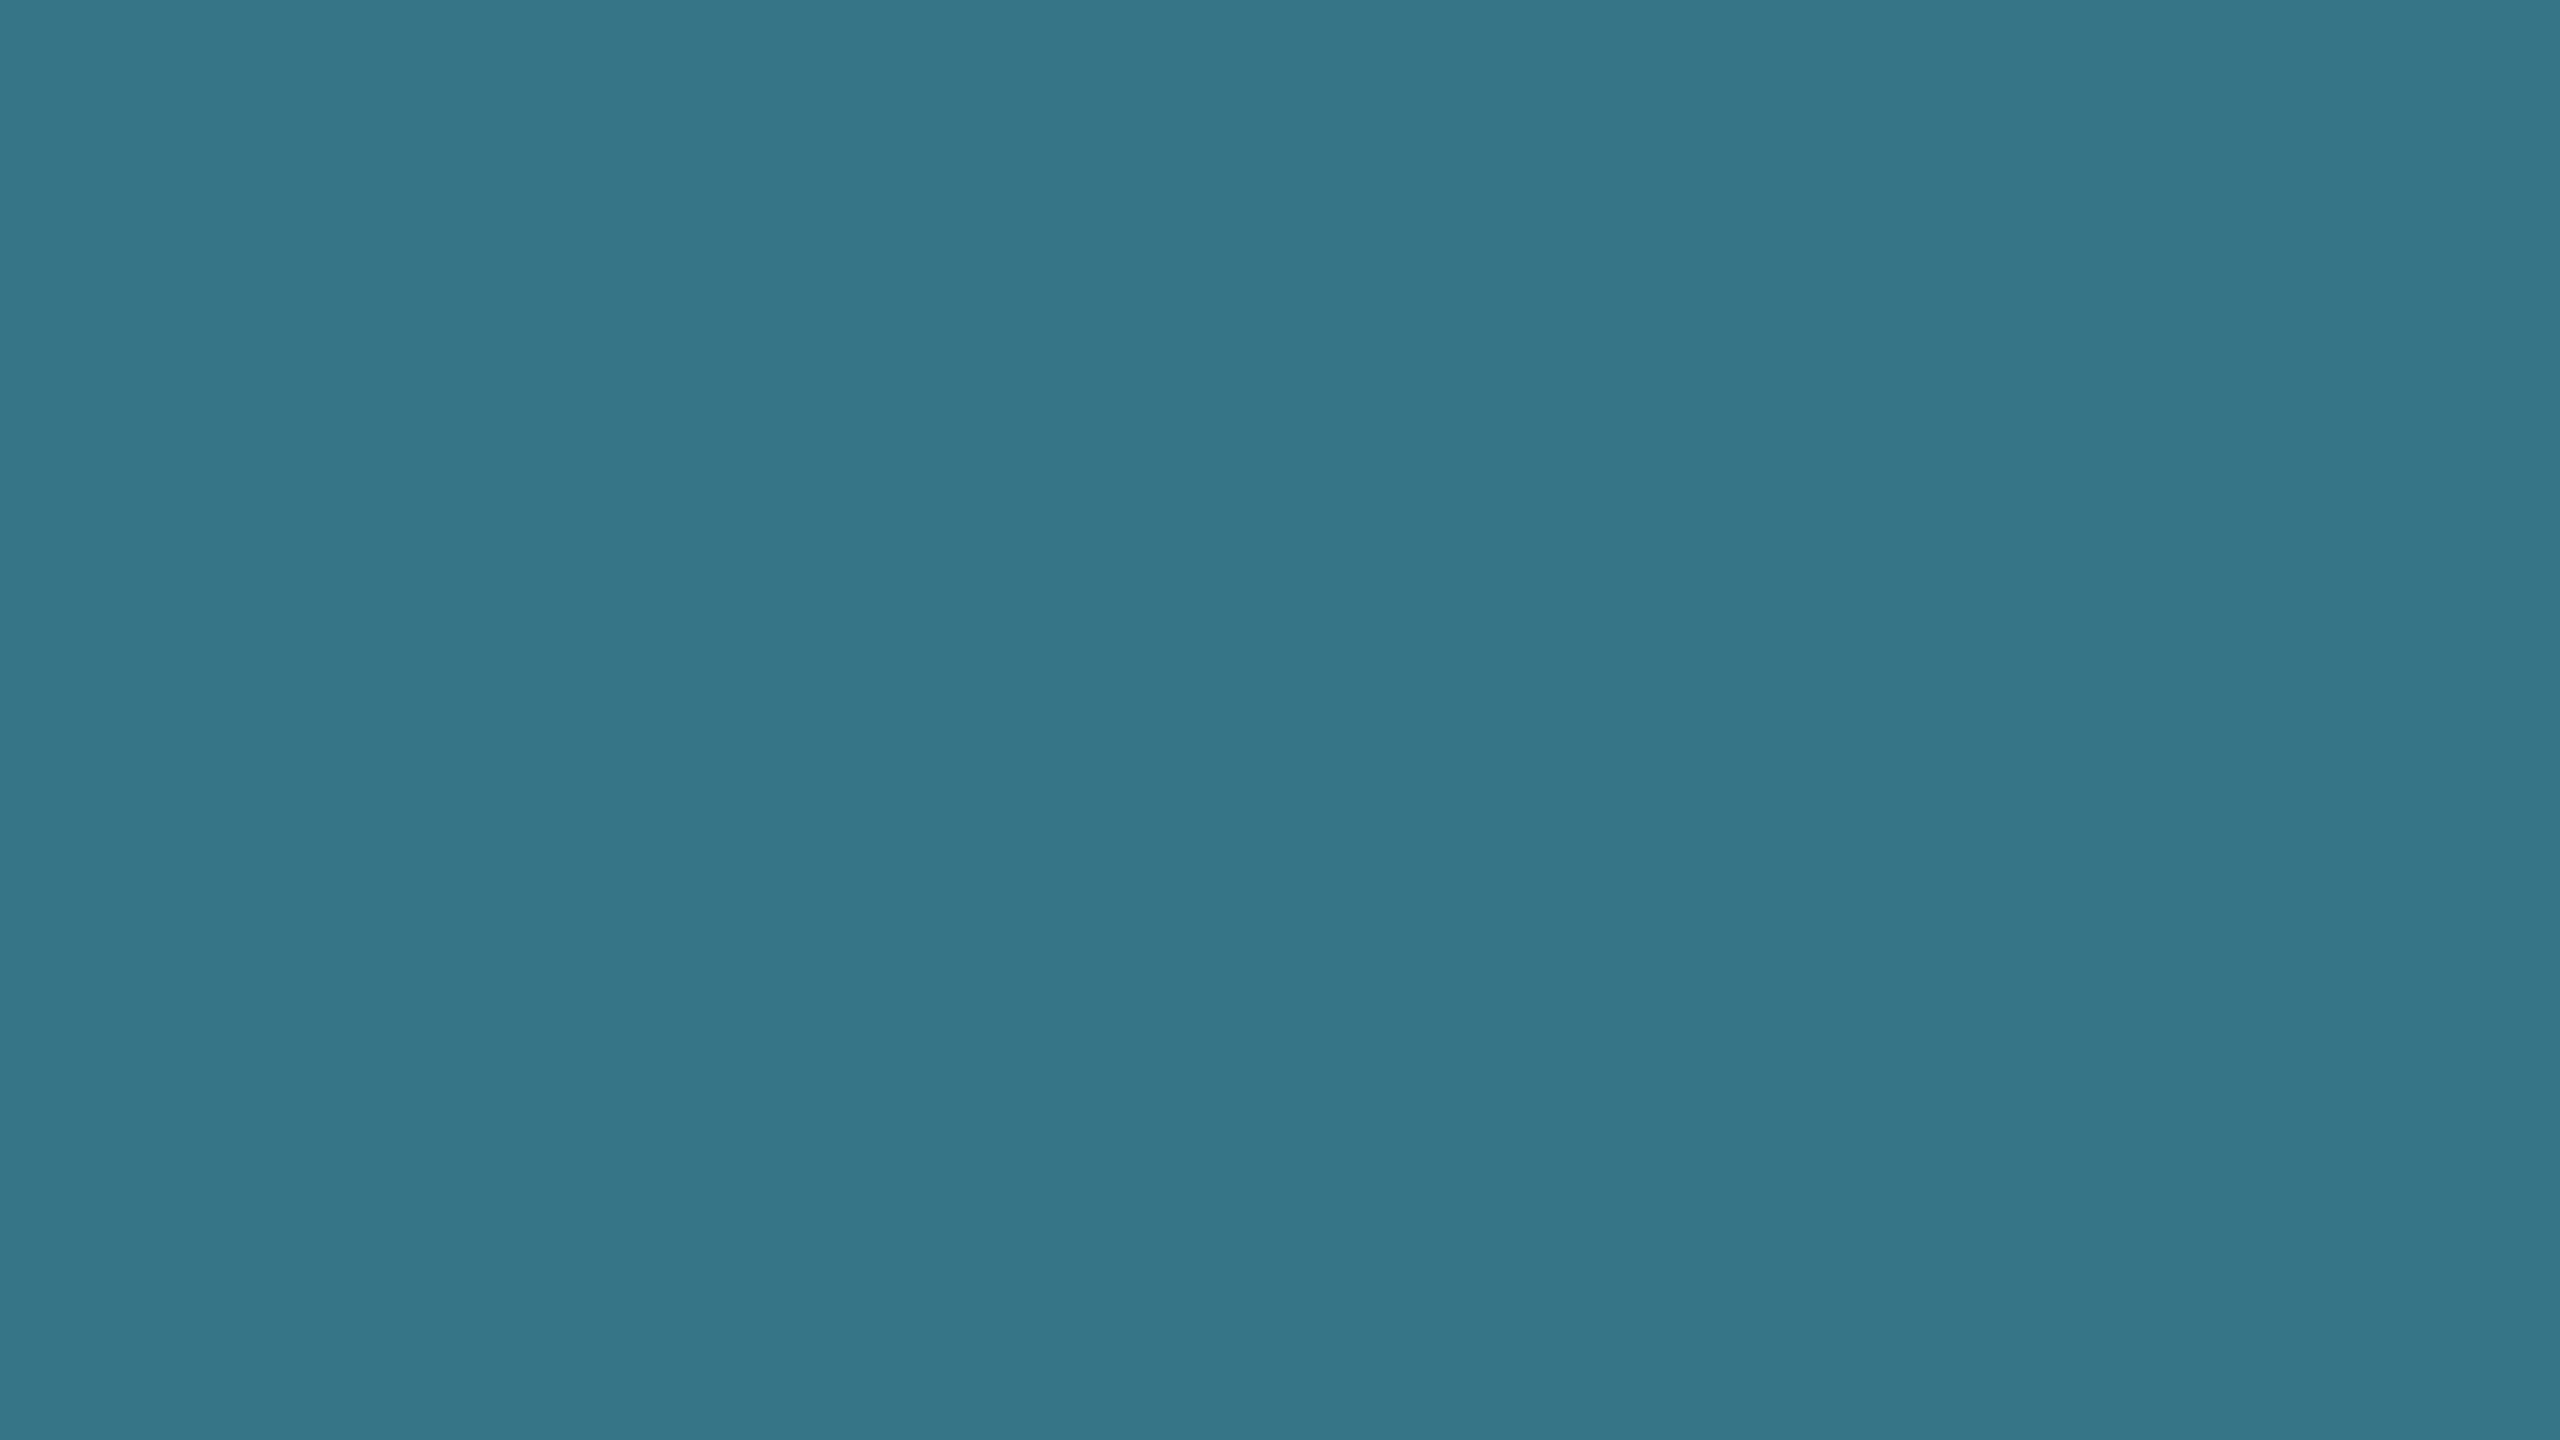 Res: 2560x1440, Solid Teal Blue Wallpaper 47198